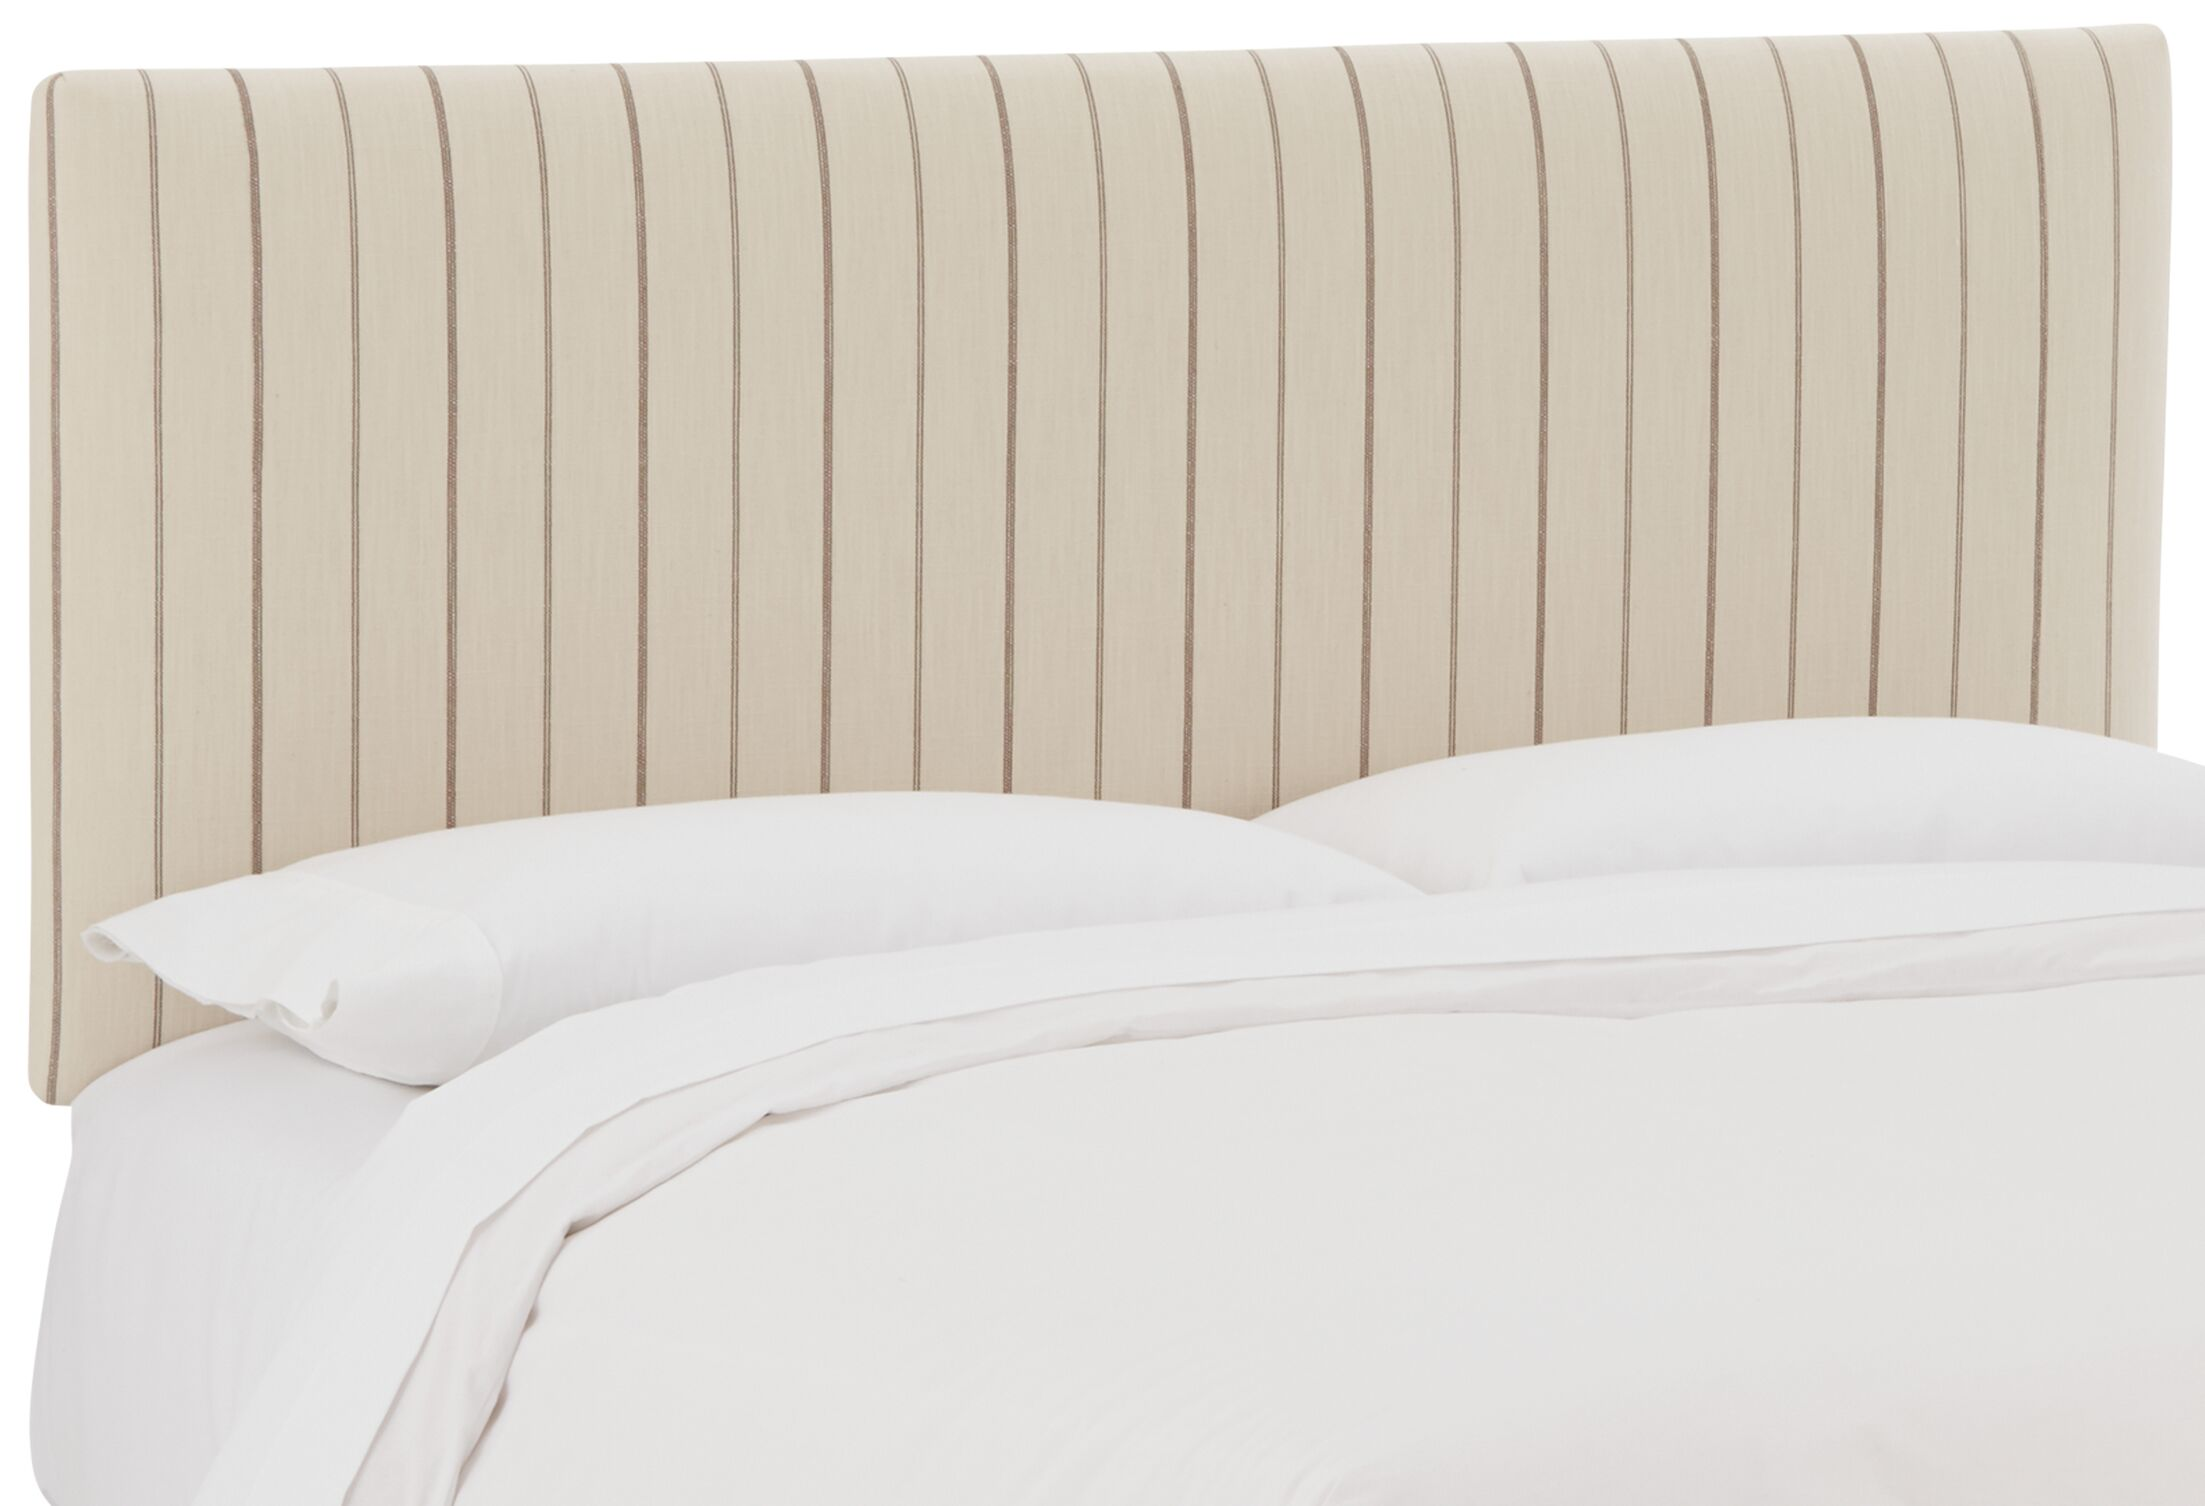 Mcdougall Upholstered Panel Headboard Size: California King, Upholstery: Fritz Charcoal